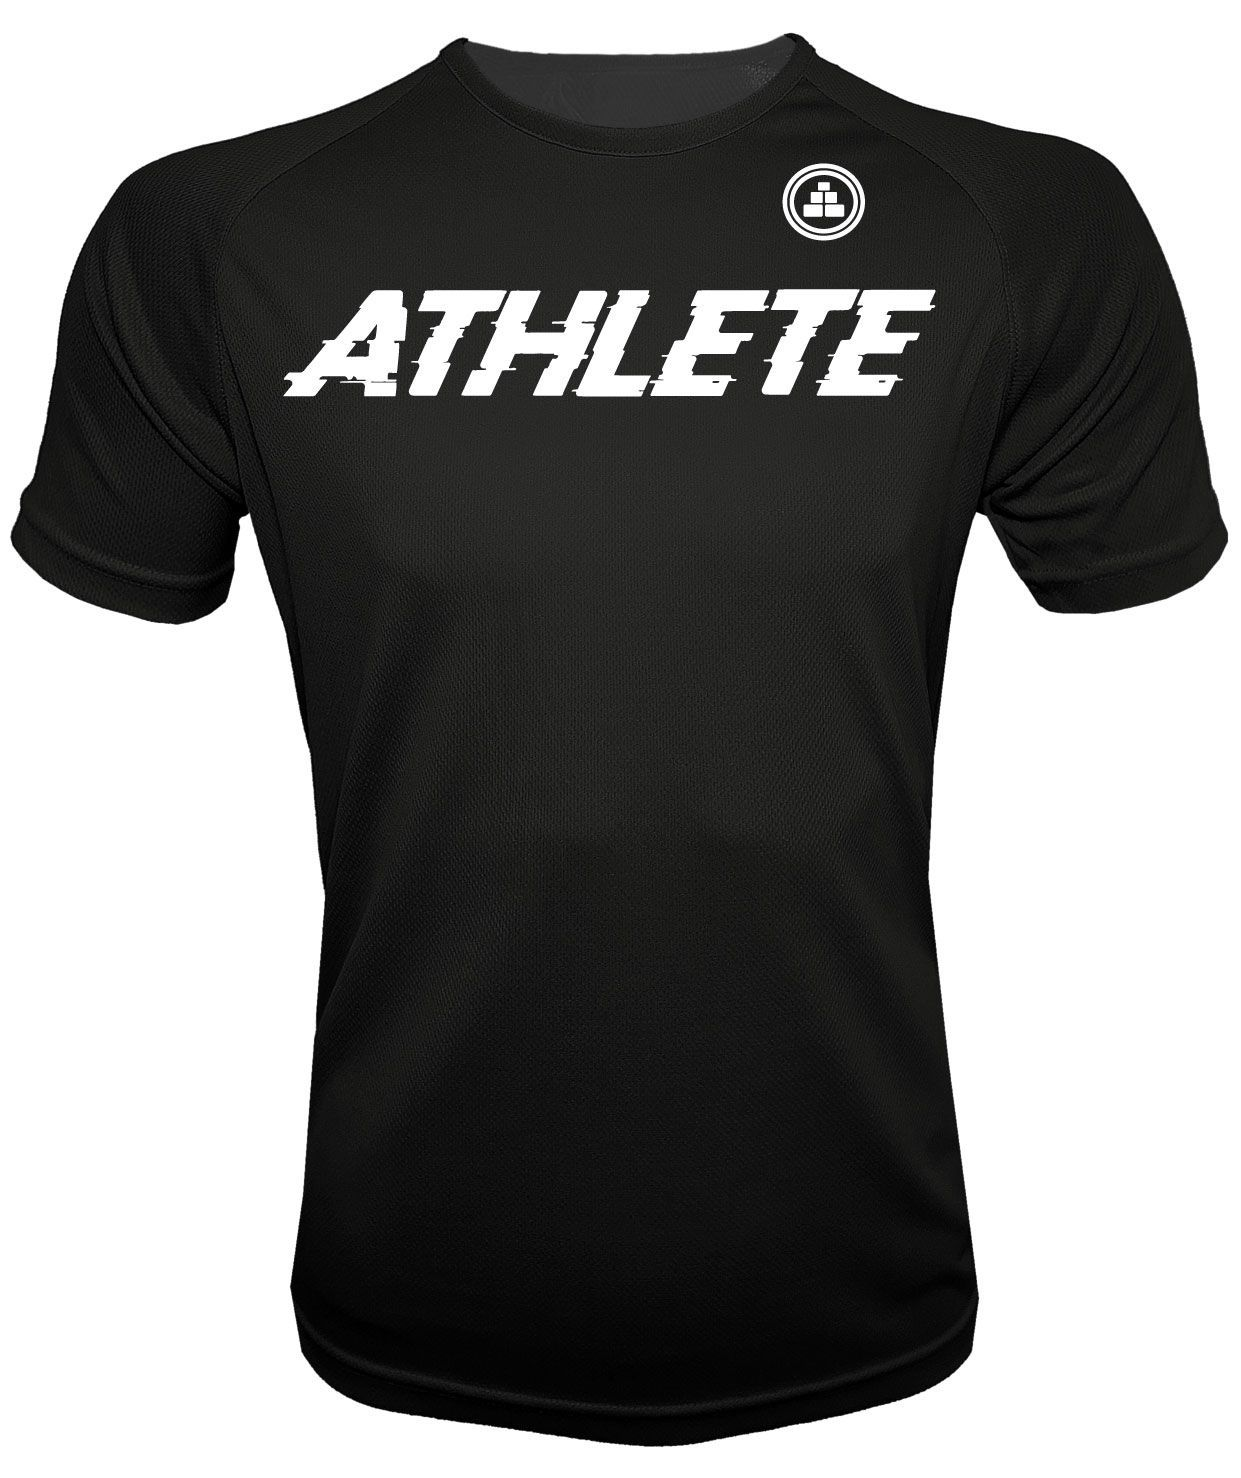 Camiseta Atleta H N